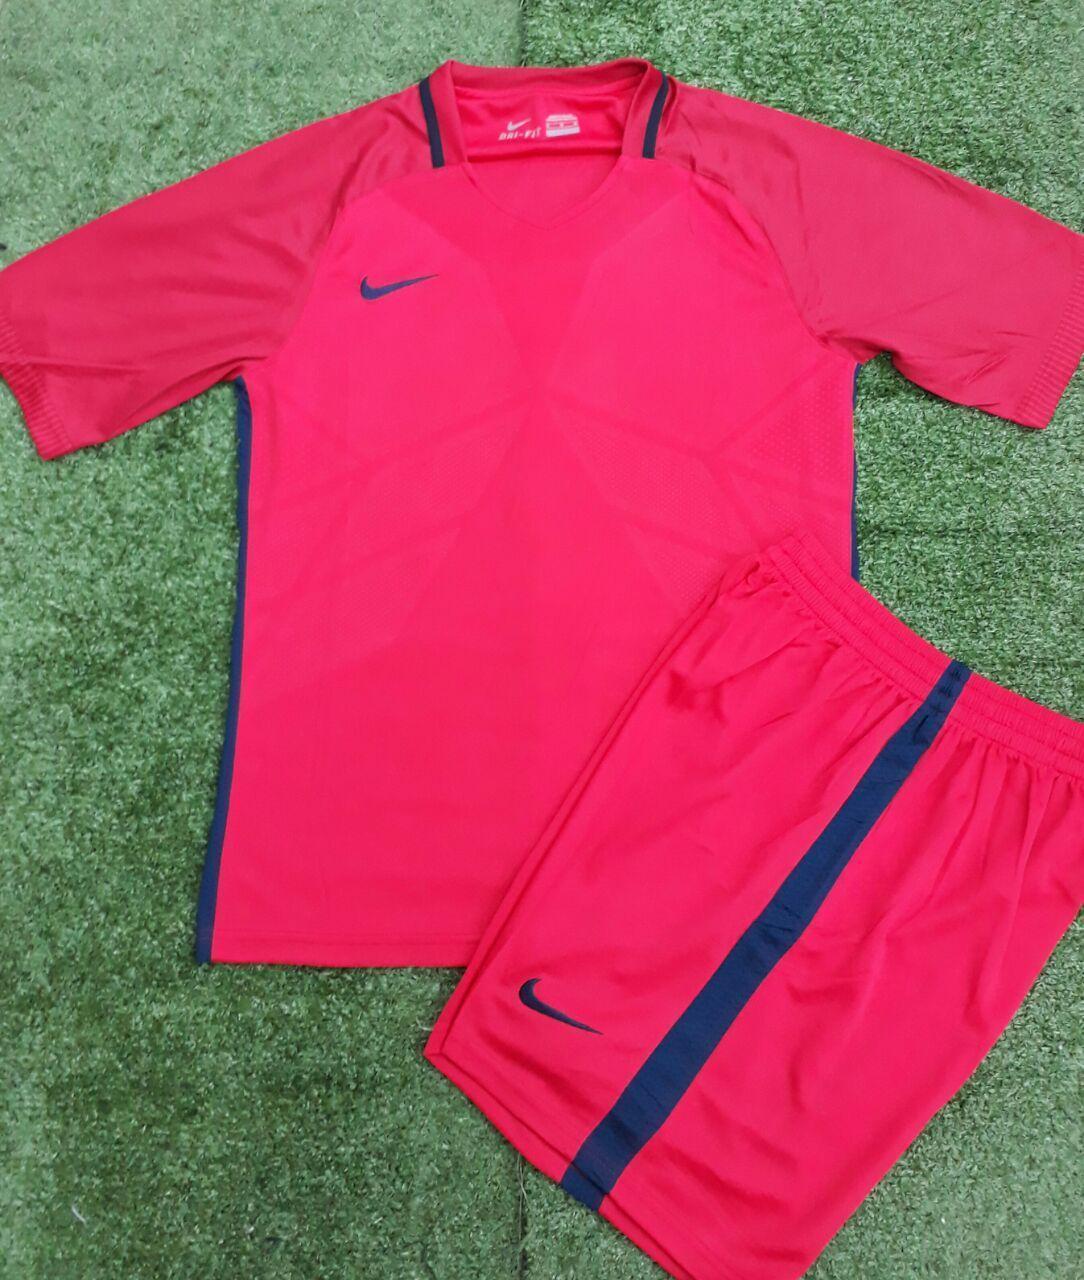 Футбольная форма на команду Nike взрослые